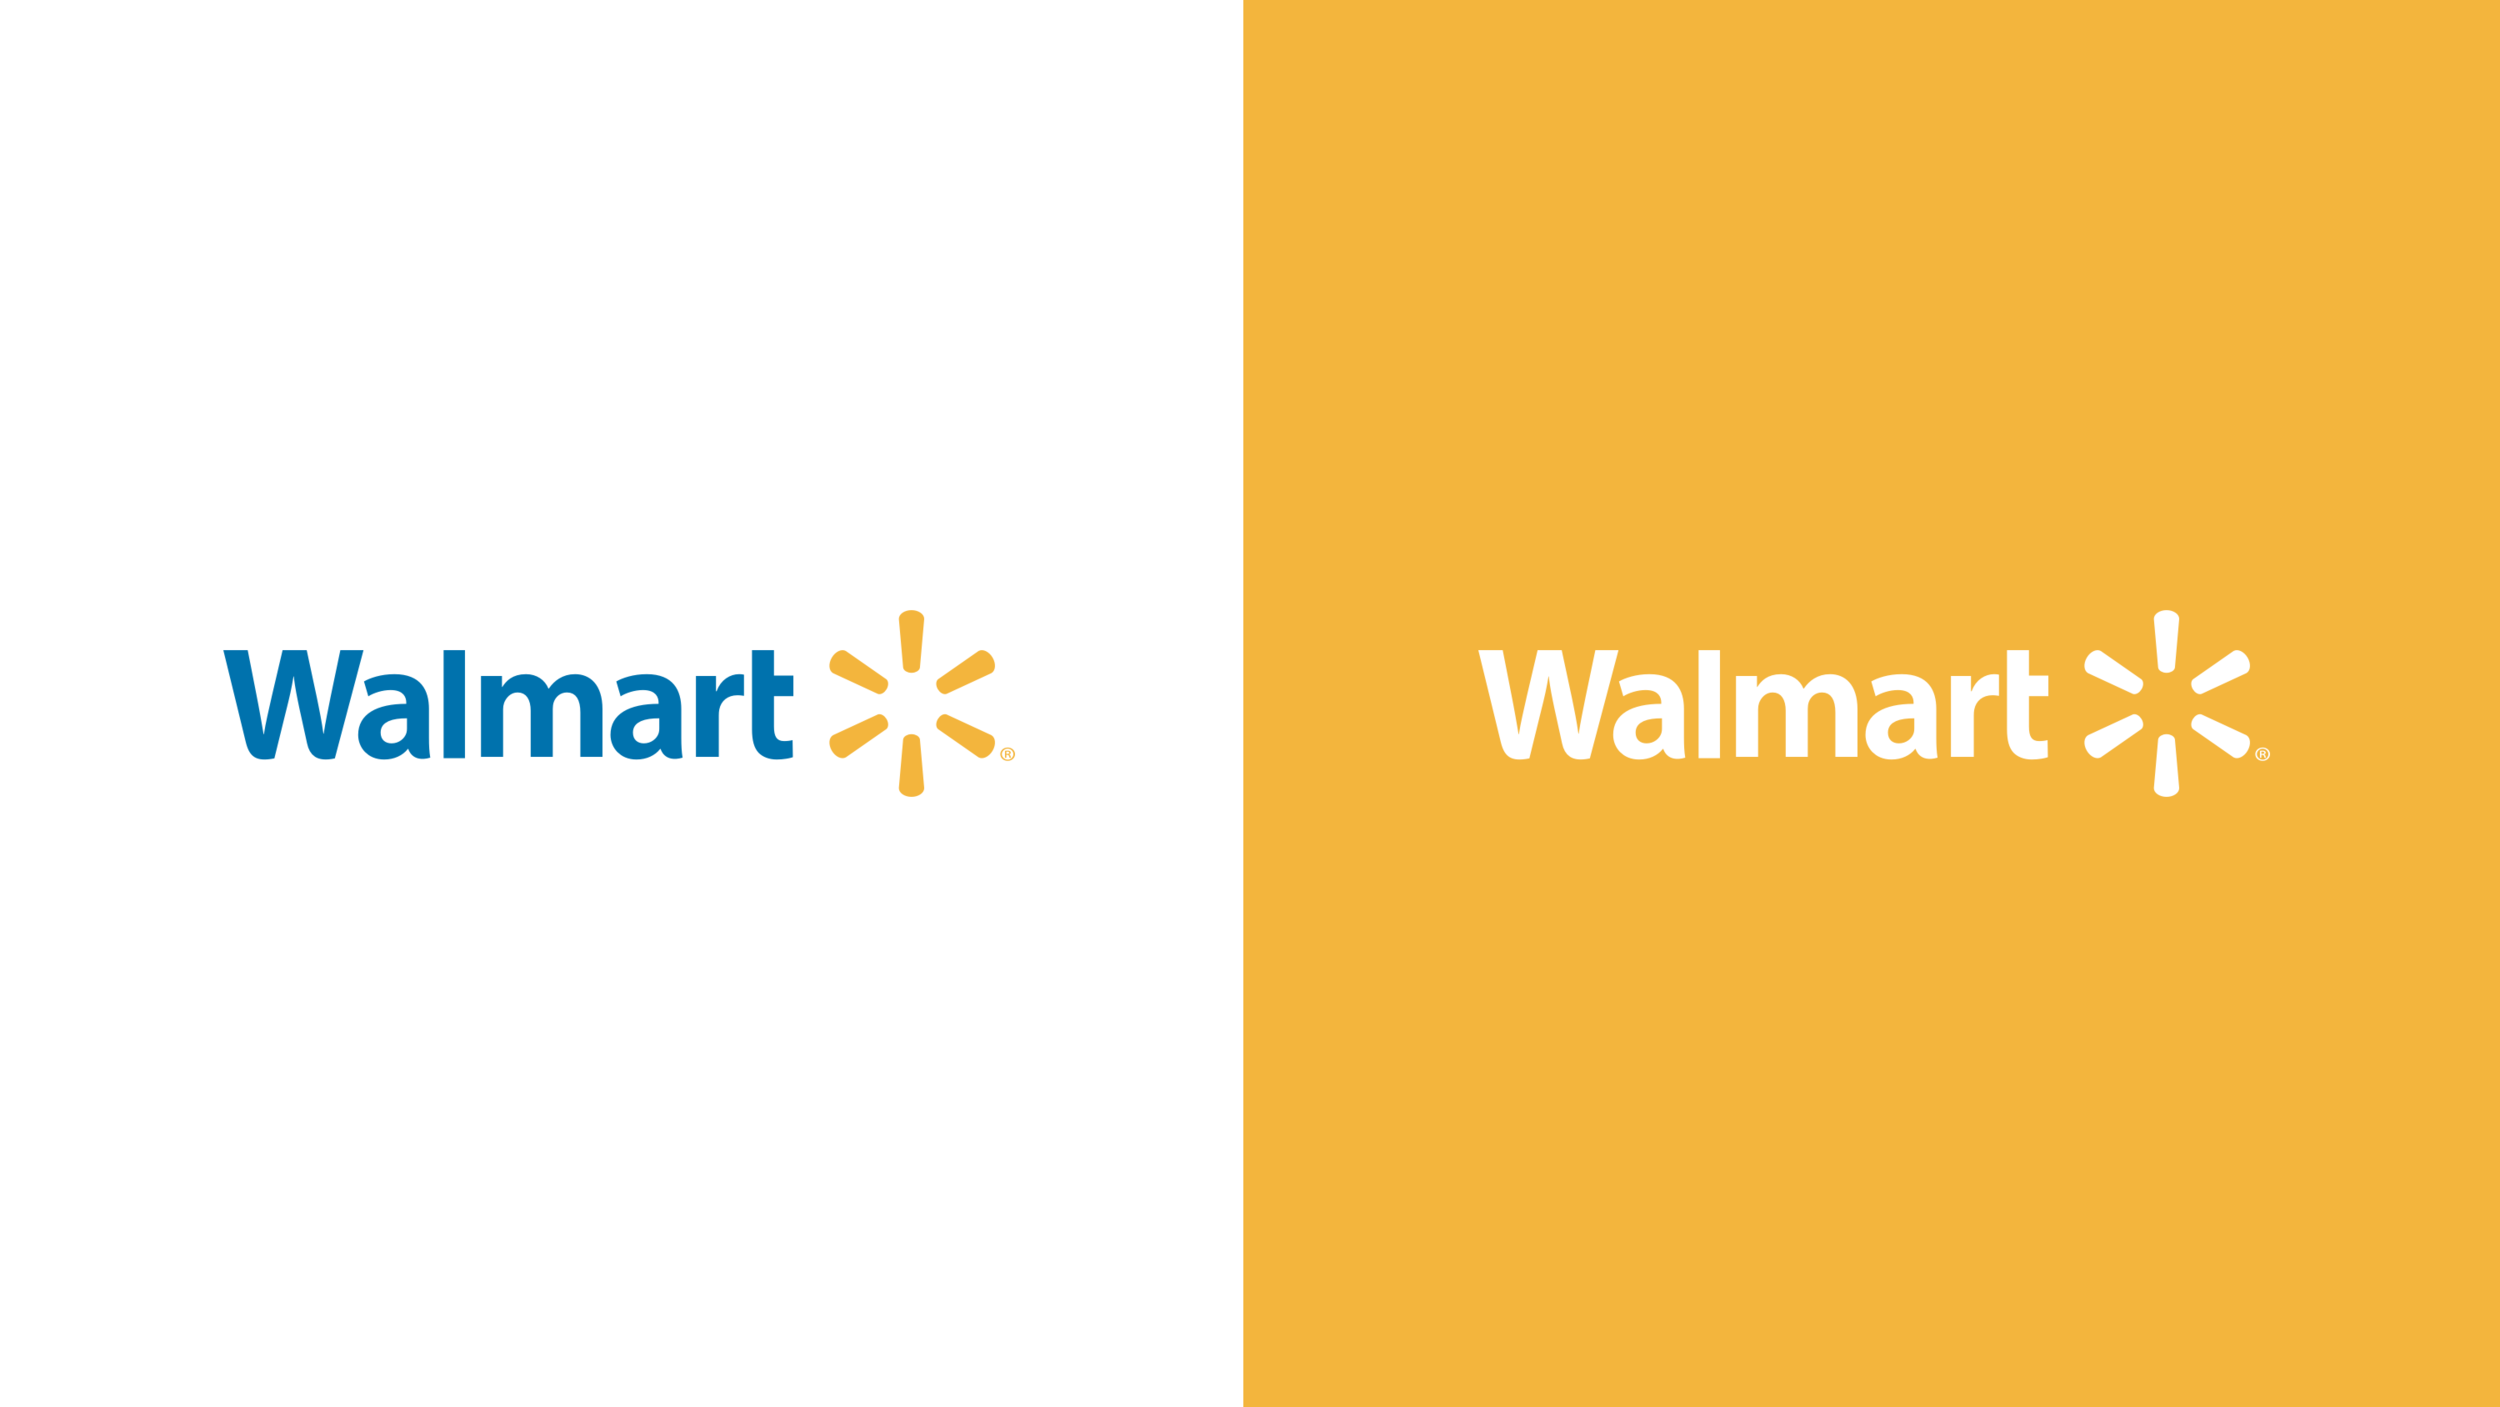 00 Walmart New.png